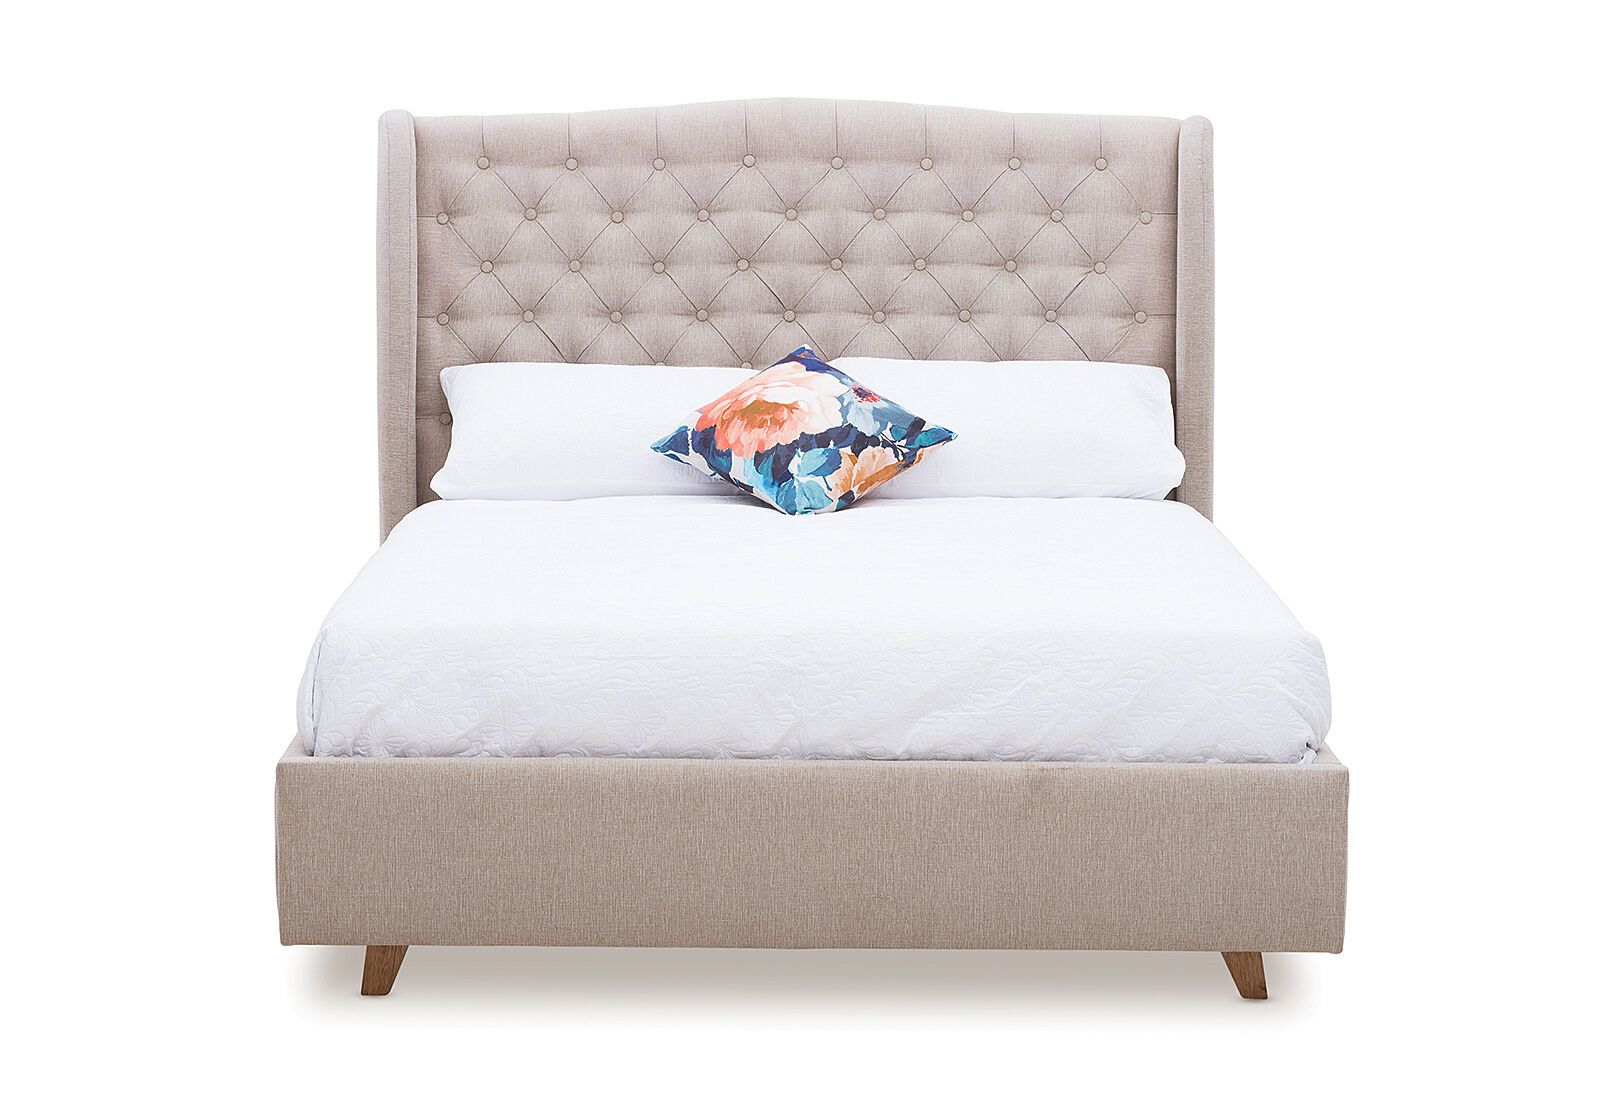 Aragon Fabric Queen Bed Amart Furniture In 2020 Cool Bedroom Furniture Furniture Bedroom Furniture